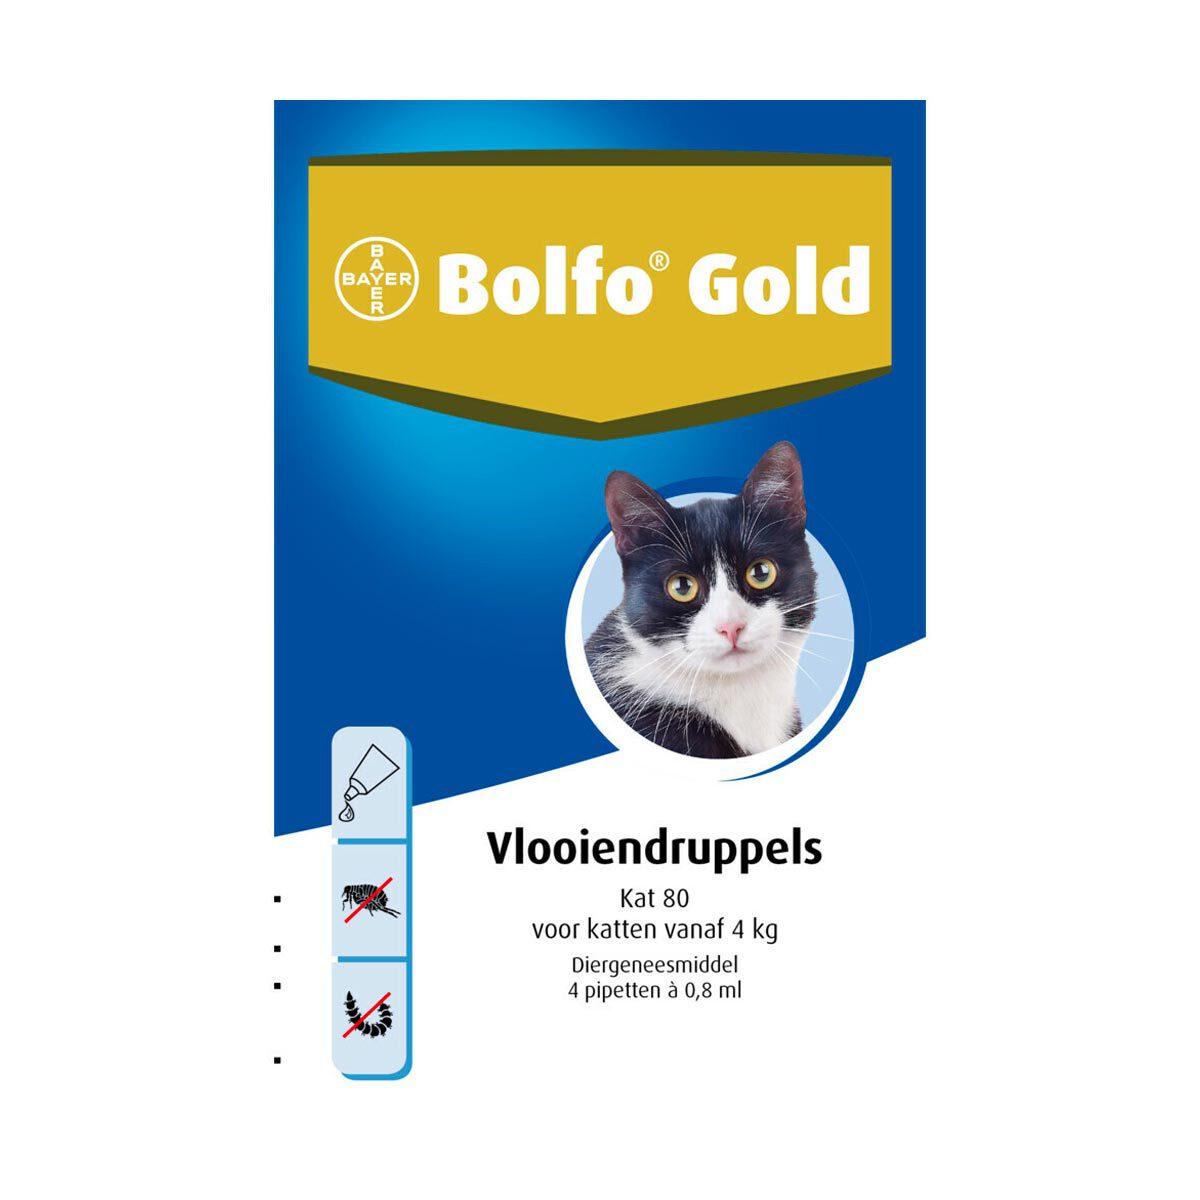 Bolfo Gold Kat 80 Vlooiendruppels vanaf 4 kg 4 pipetten